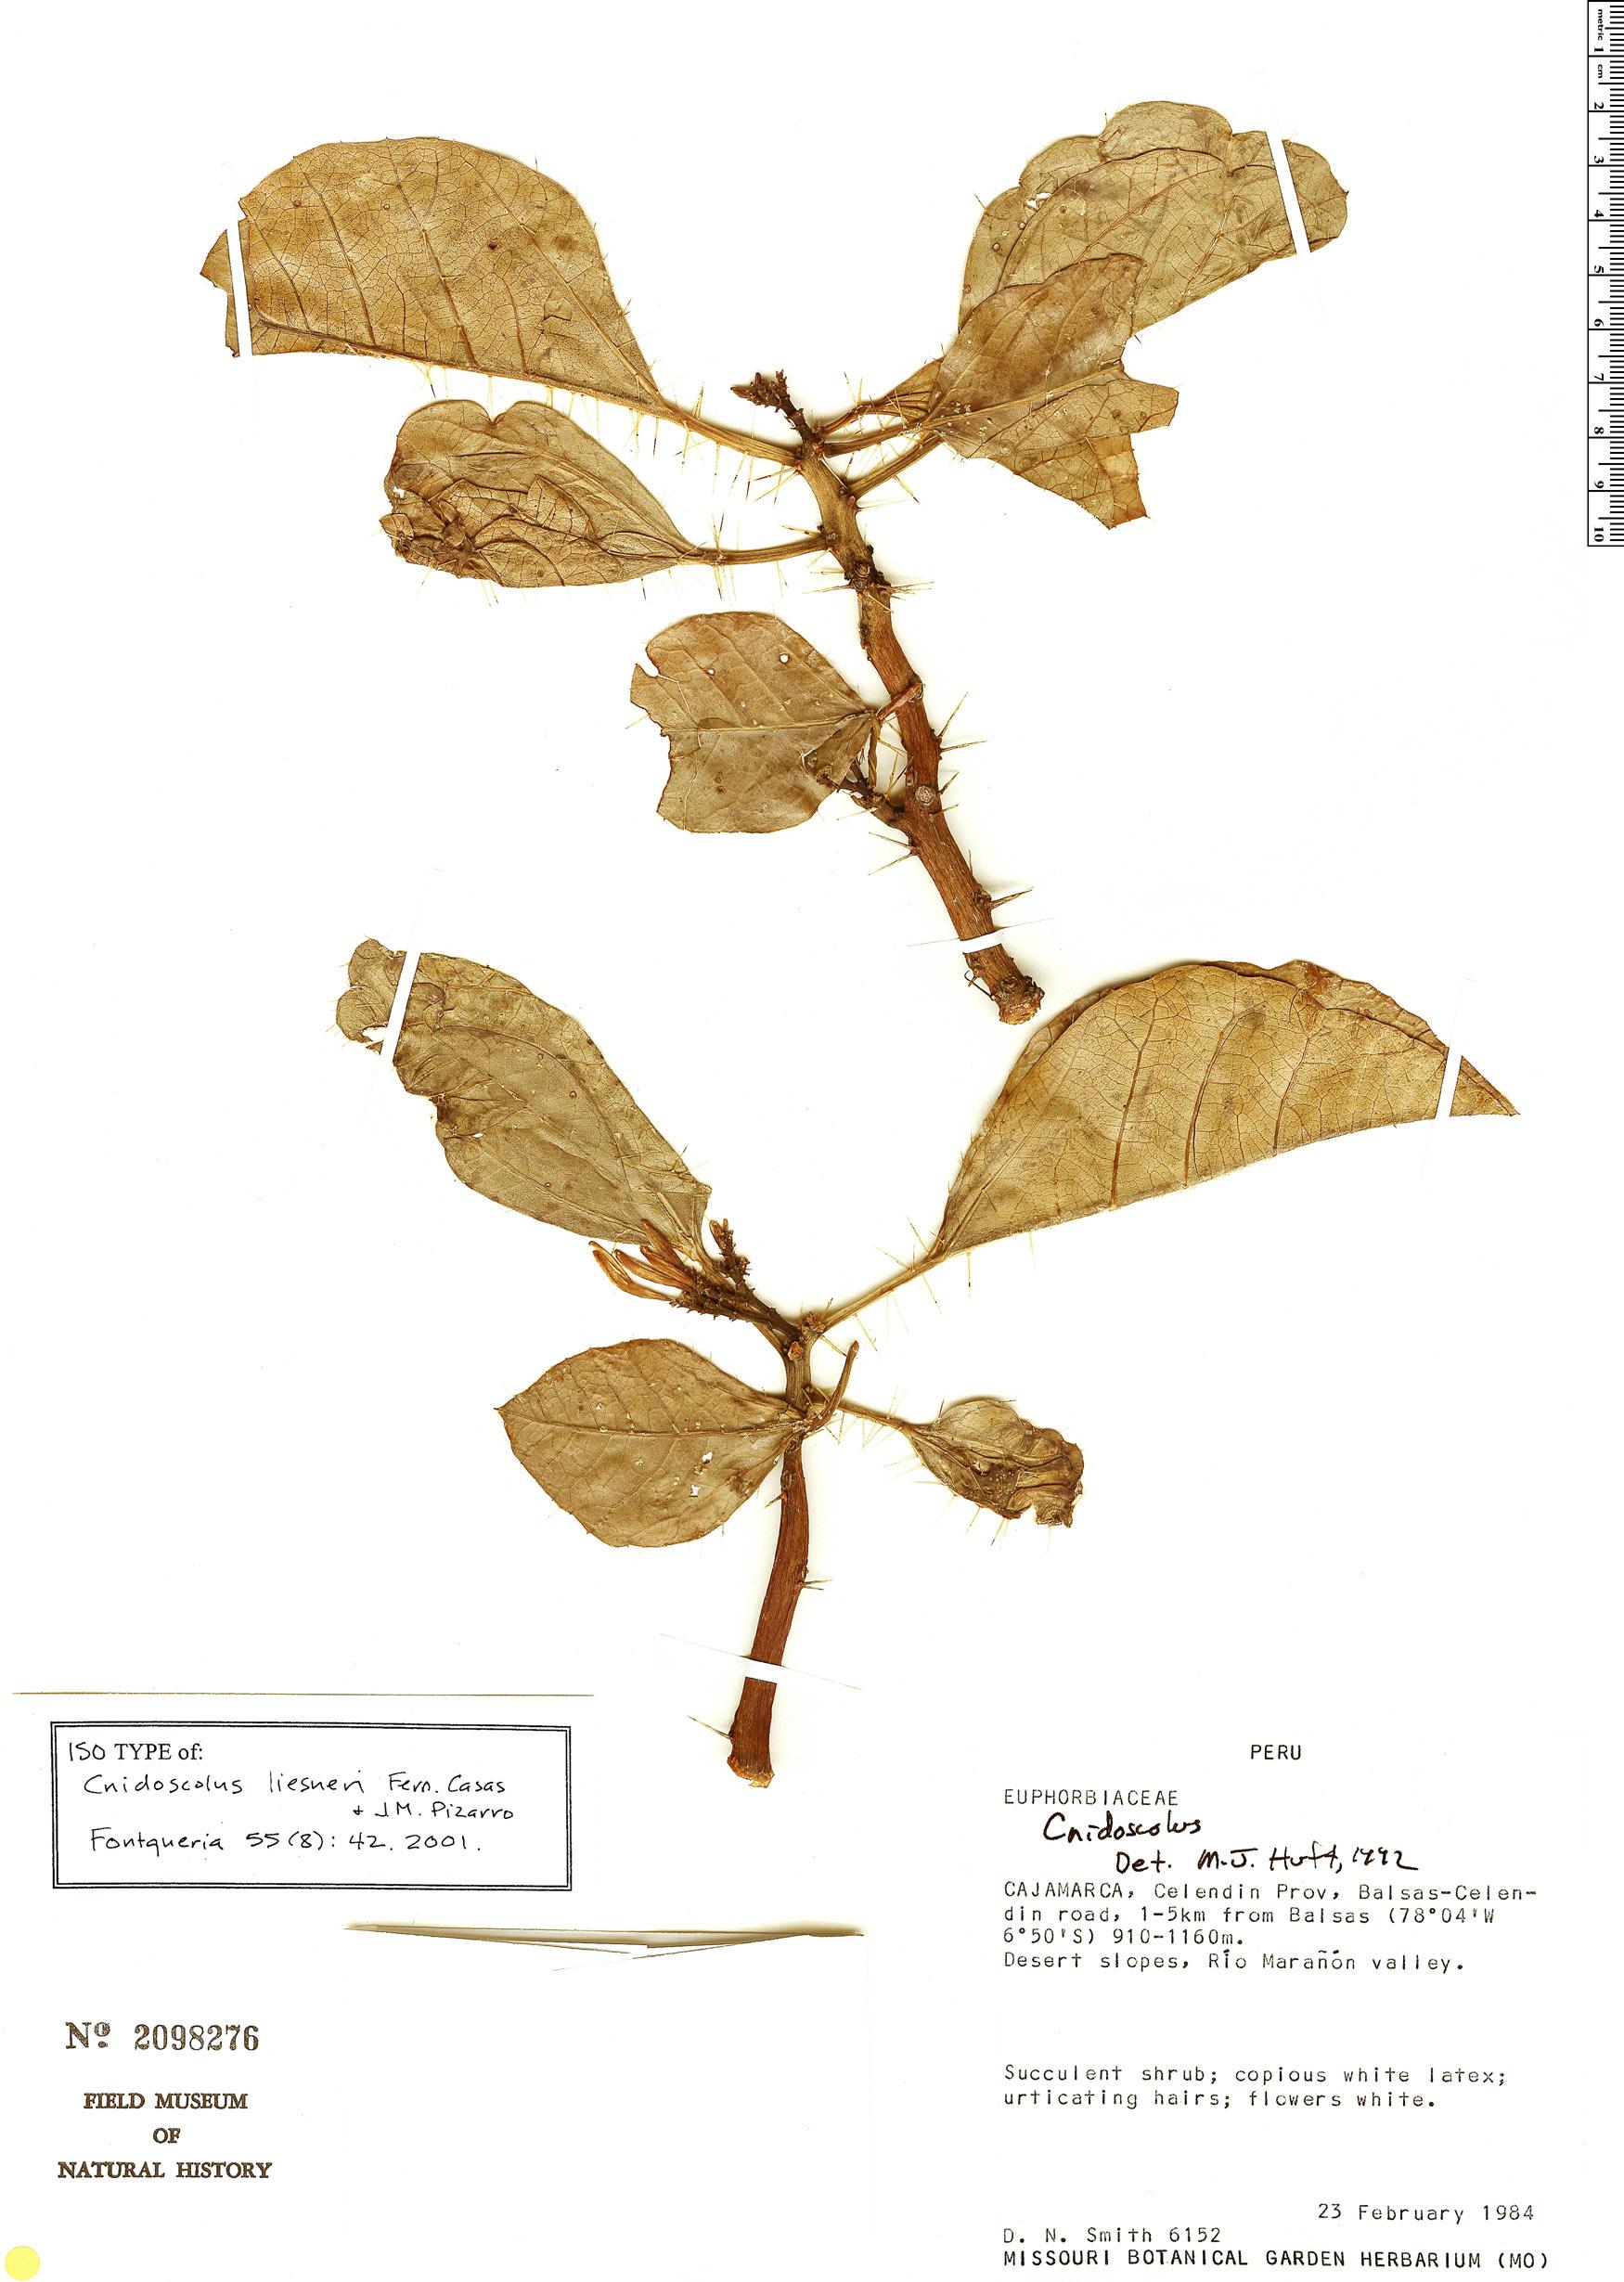 Specimen: Cnidoscolus liesneri